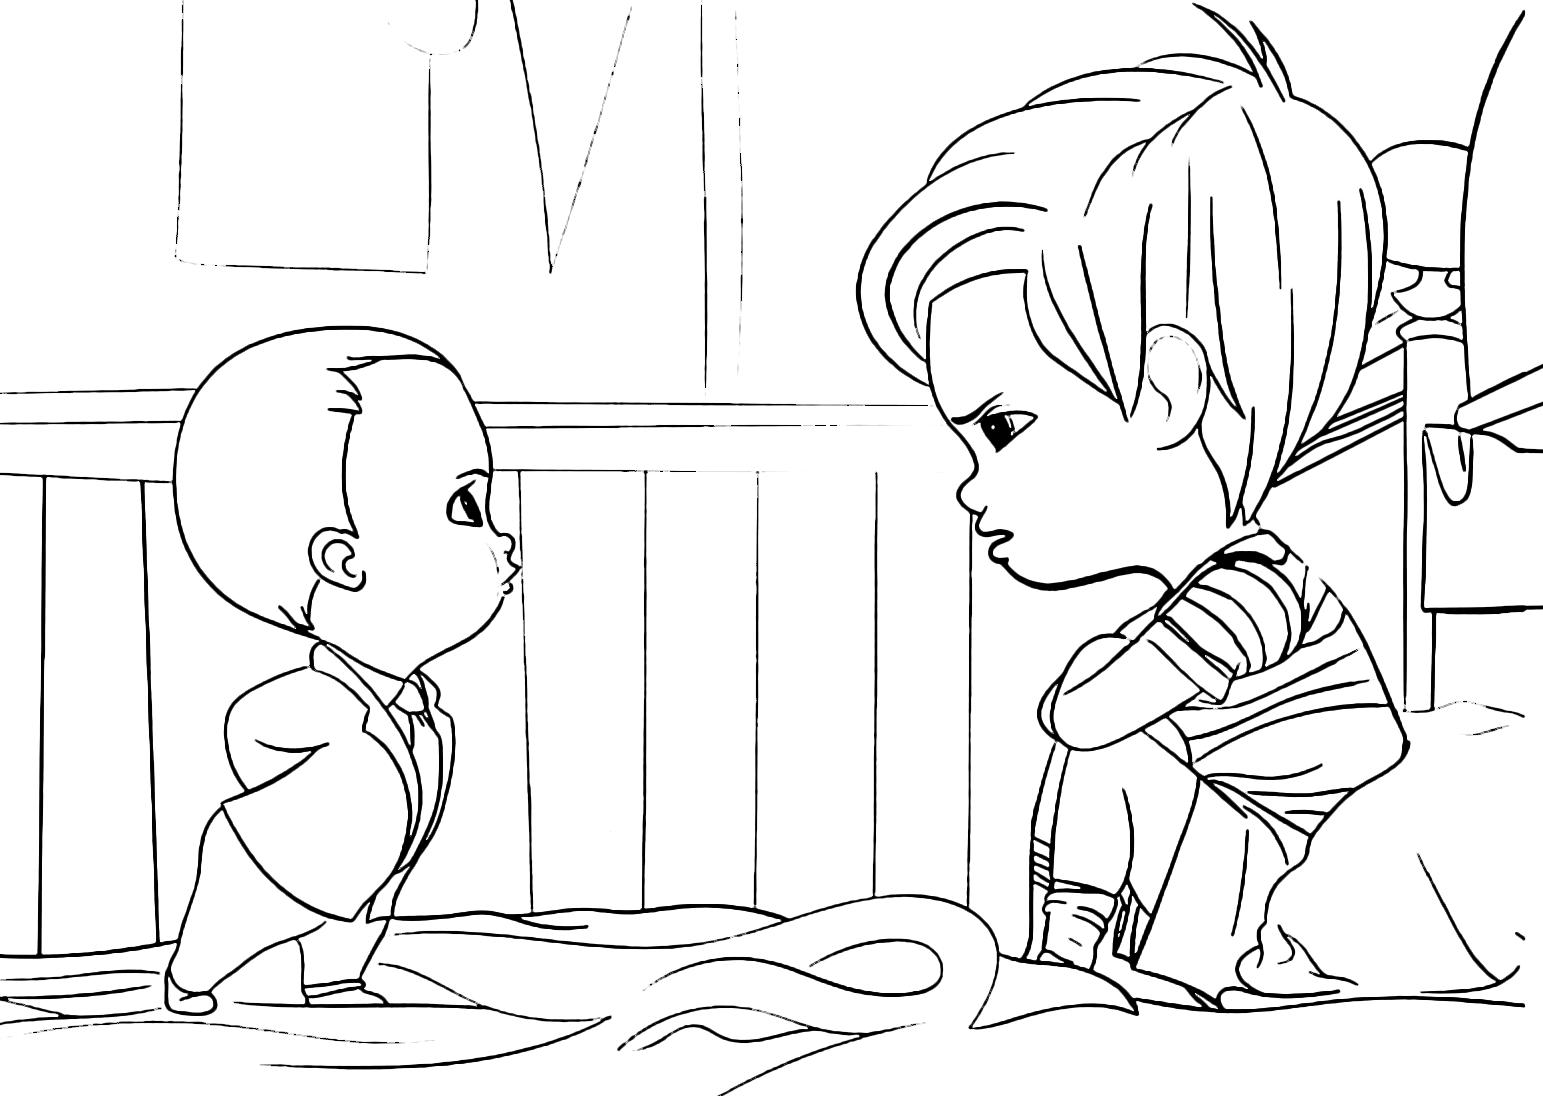 Baby Boss - Baby Boss and Tim speak in the bedroom